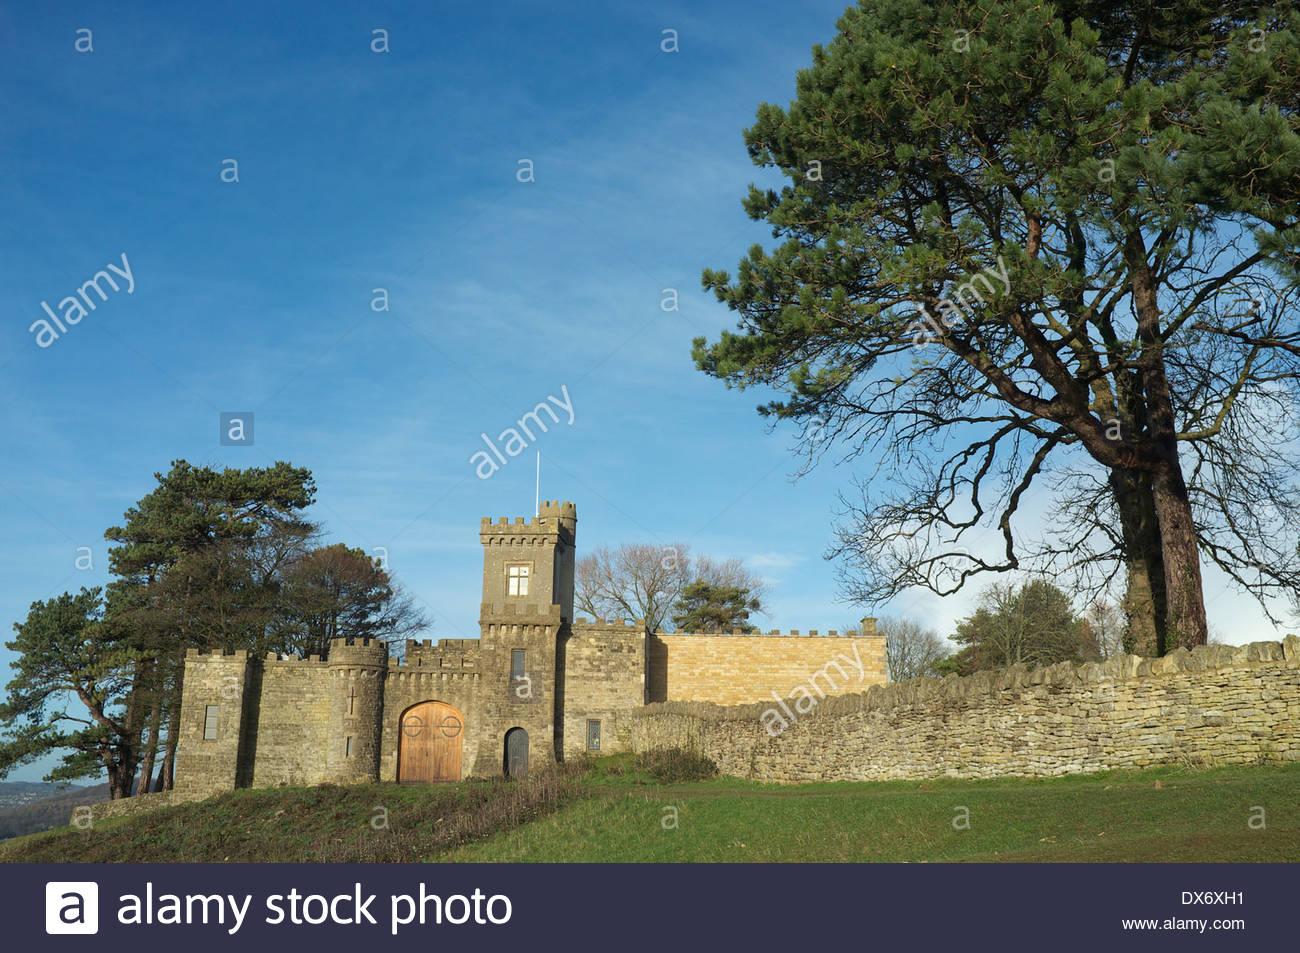 Rodborough Hill Fort, on Rodborough Common, near Stroud in Gloucestershire, UK. Stock Photo